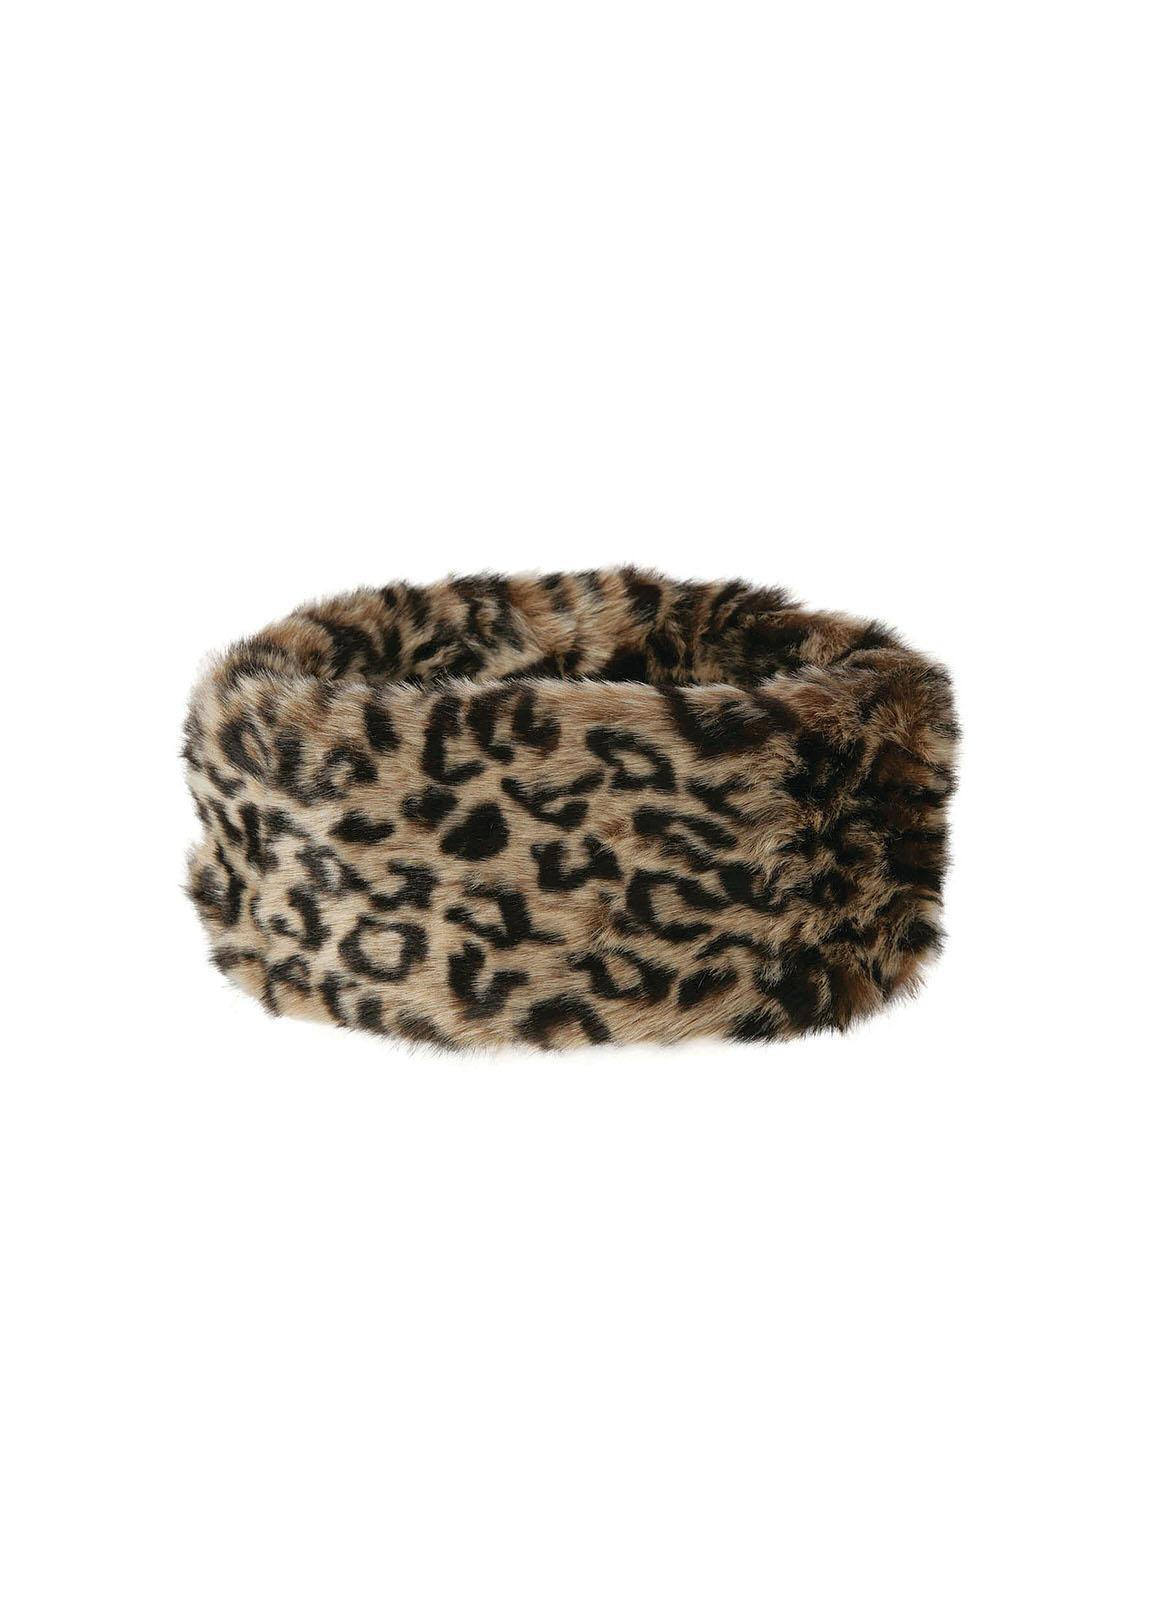 Faux_Fur_Headband_Leopard_Image_1